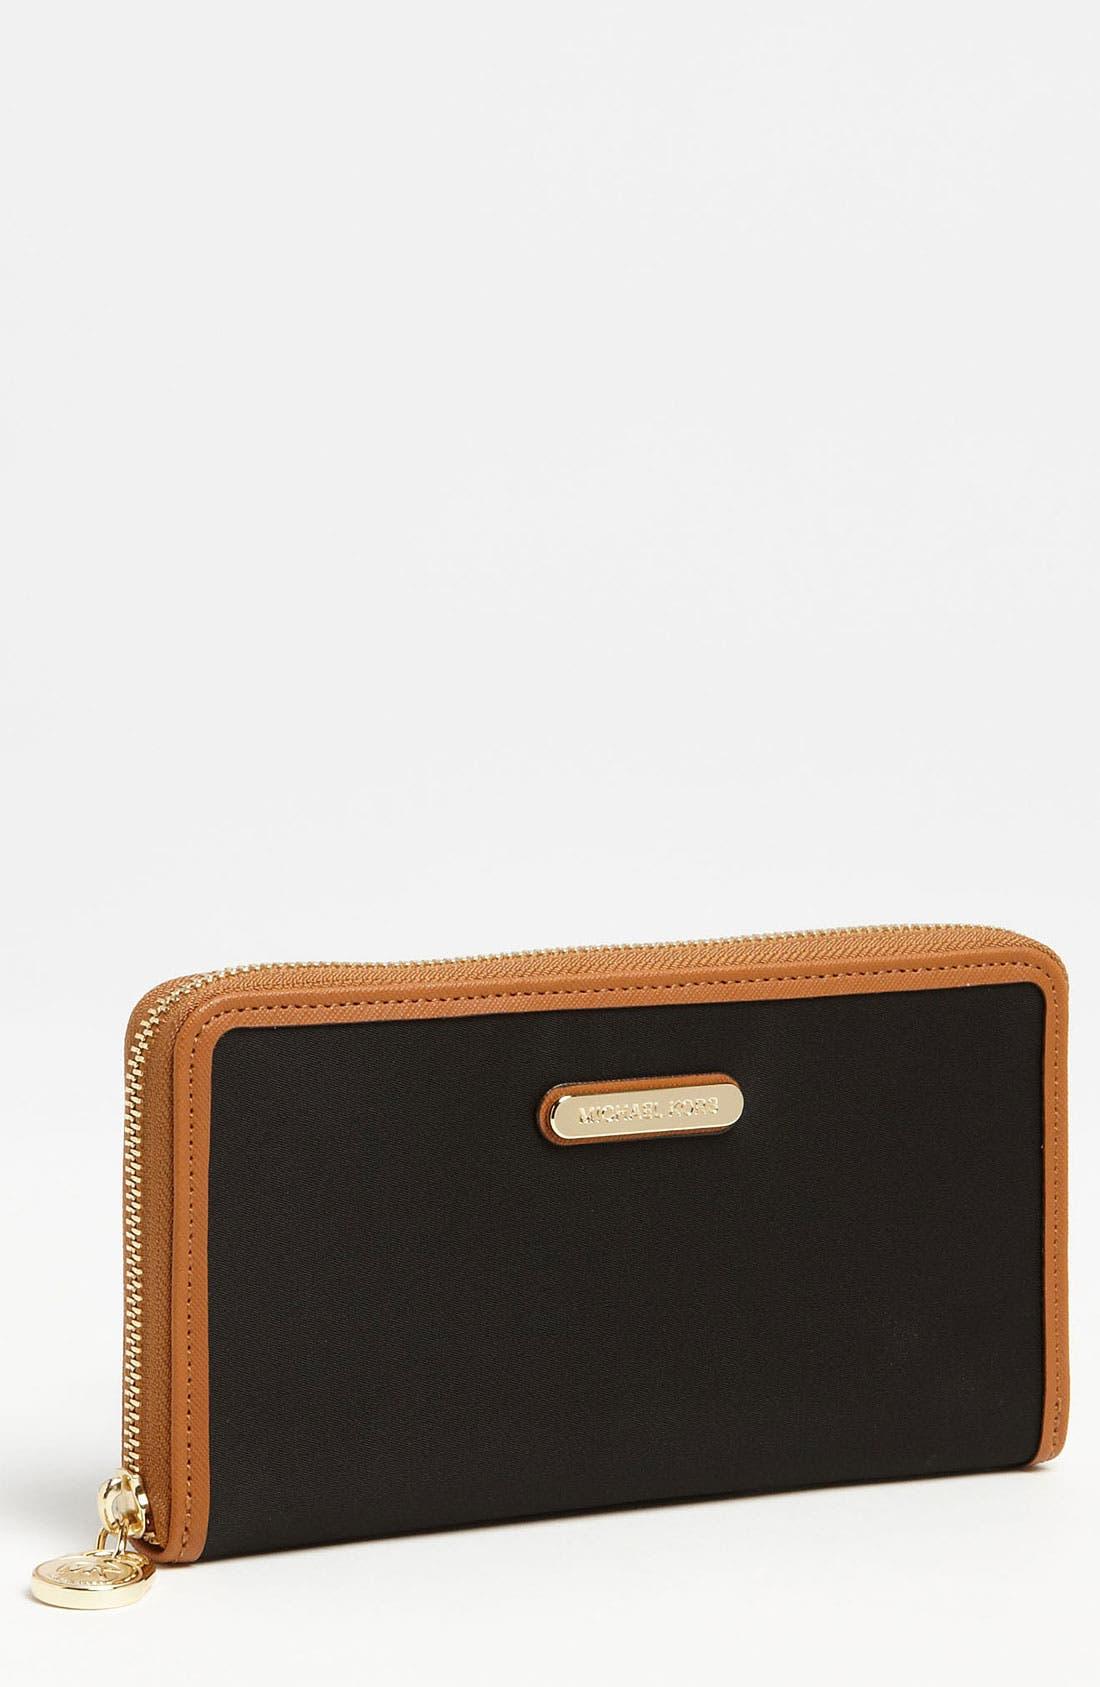 Main Image - MICHAEL Michael Kors 'Kempton' Zip Around Continental Wallet